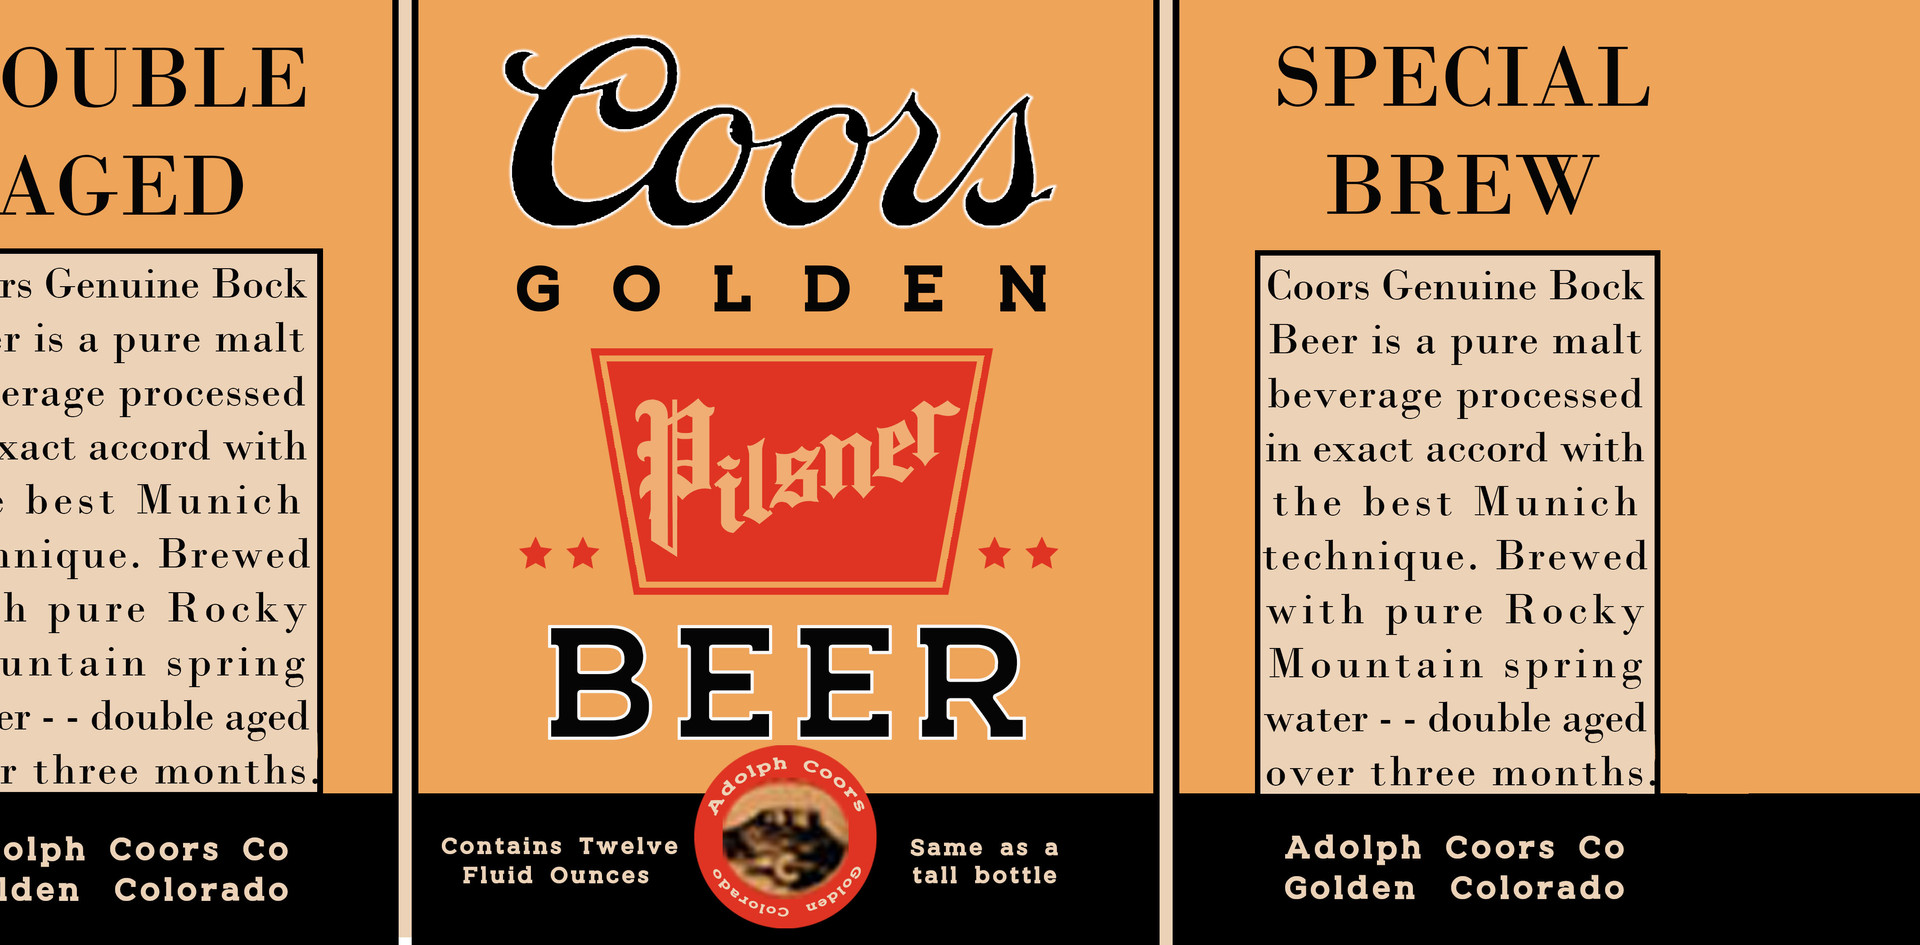 Coors beer bottle label #1